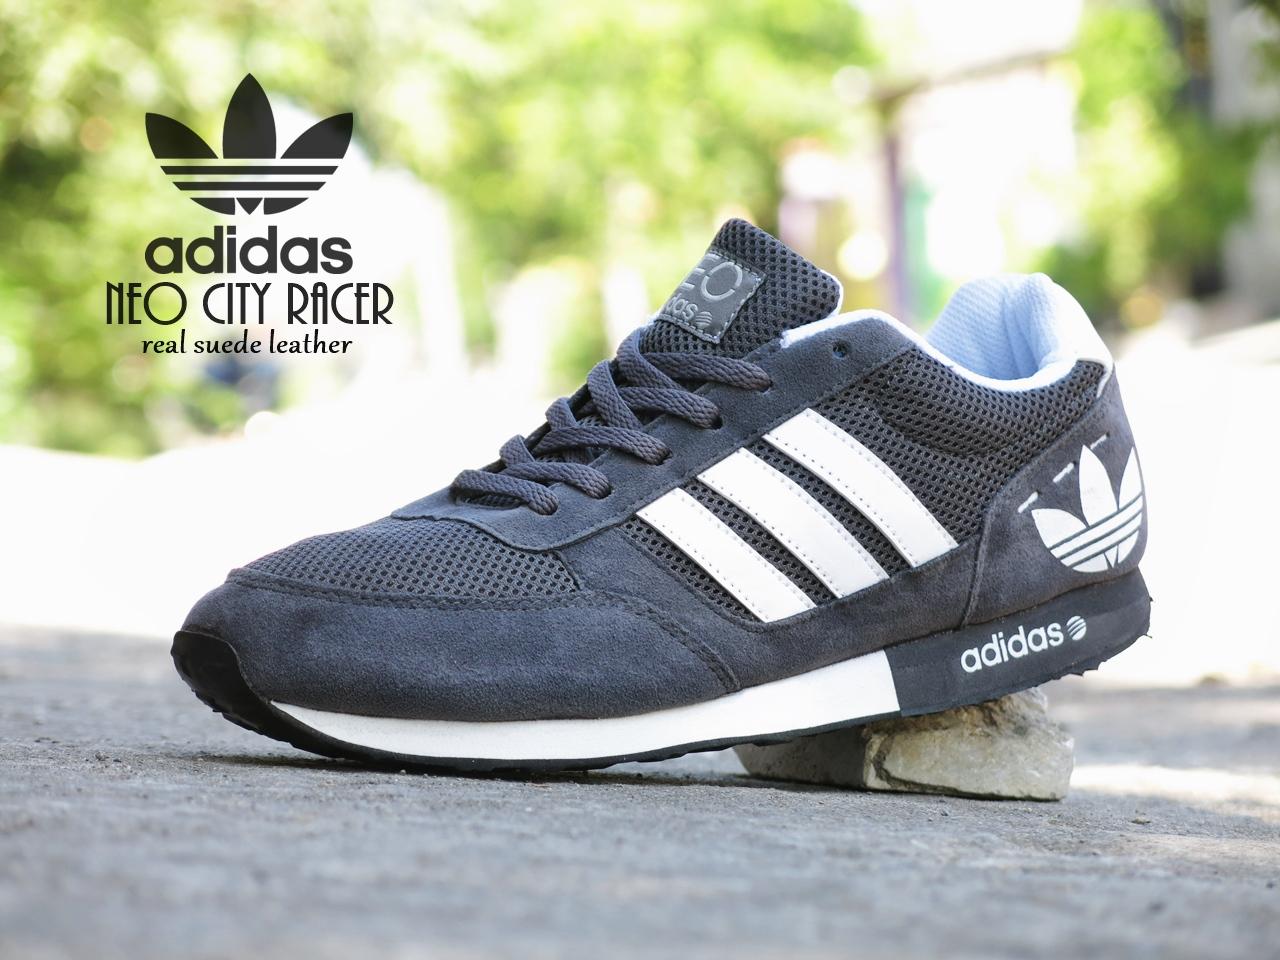 ... denmark jual sepatu sport adidas neo city racer grade ori abu2 putih  kets casual lapak sepatu 406bdbe9ef